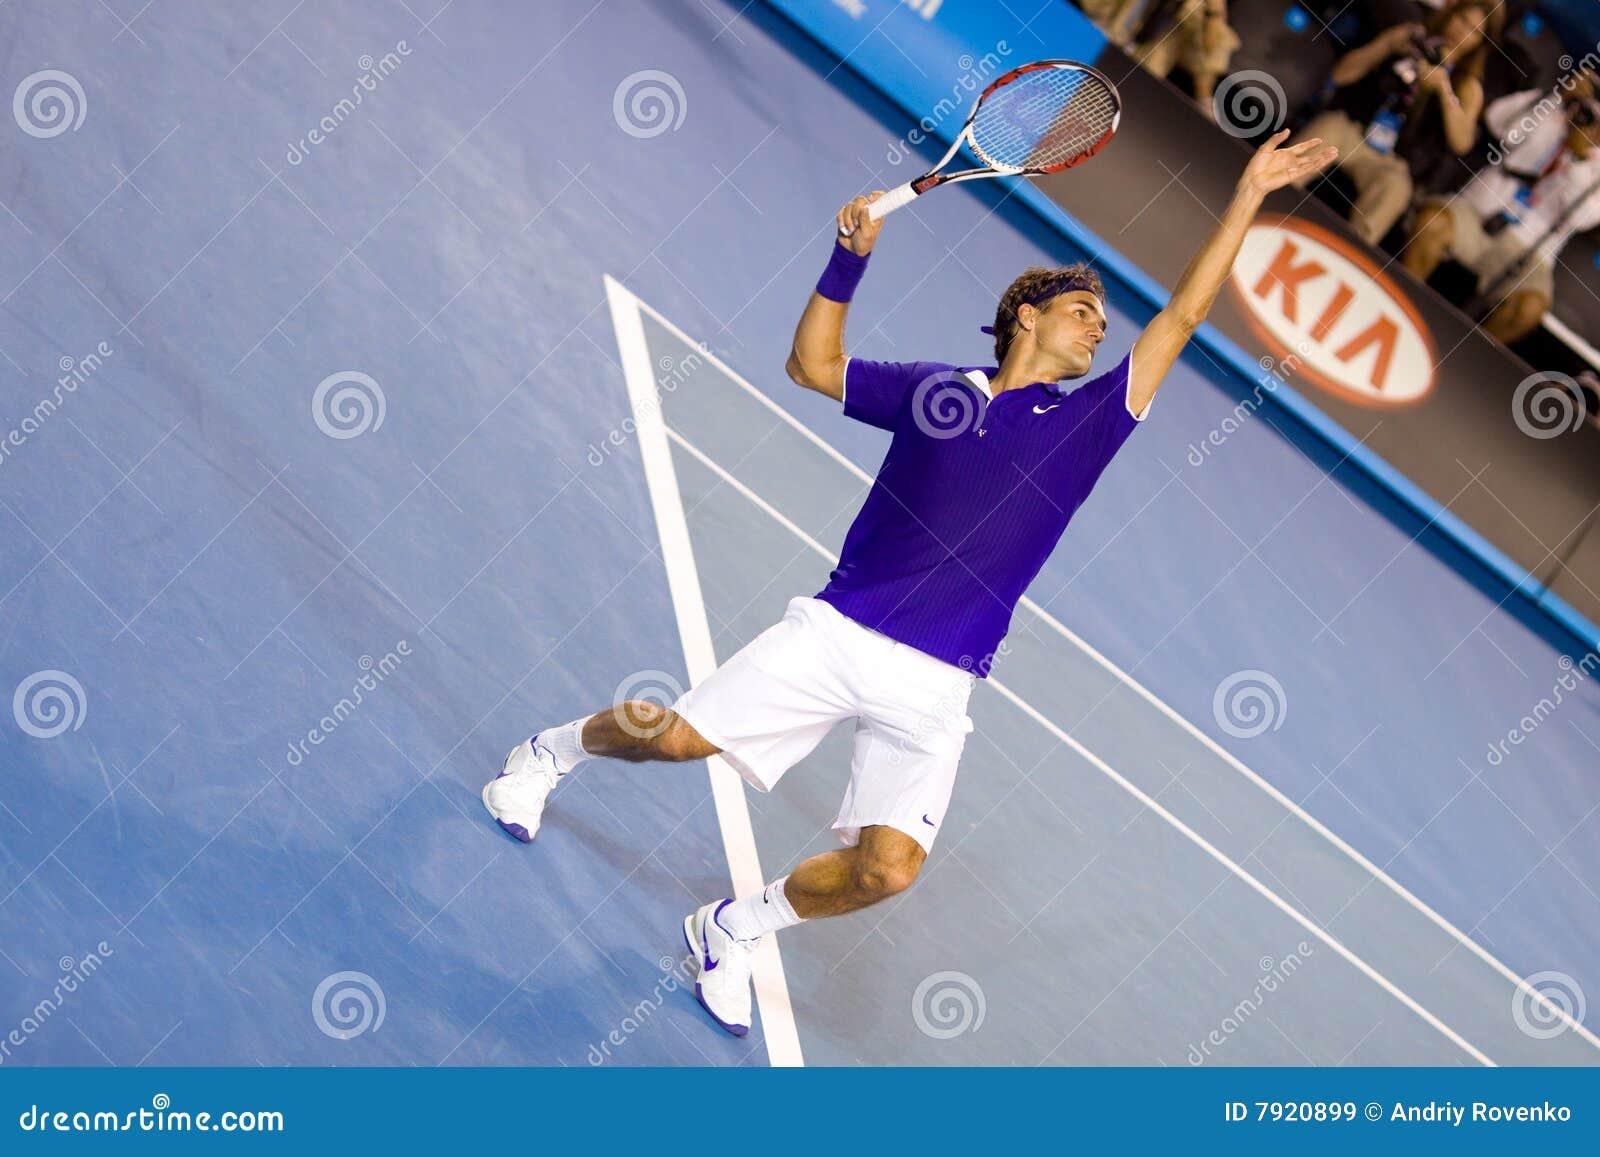 Jugador de tenis Roger Federer